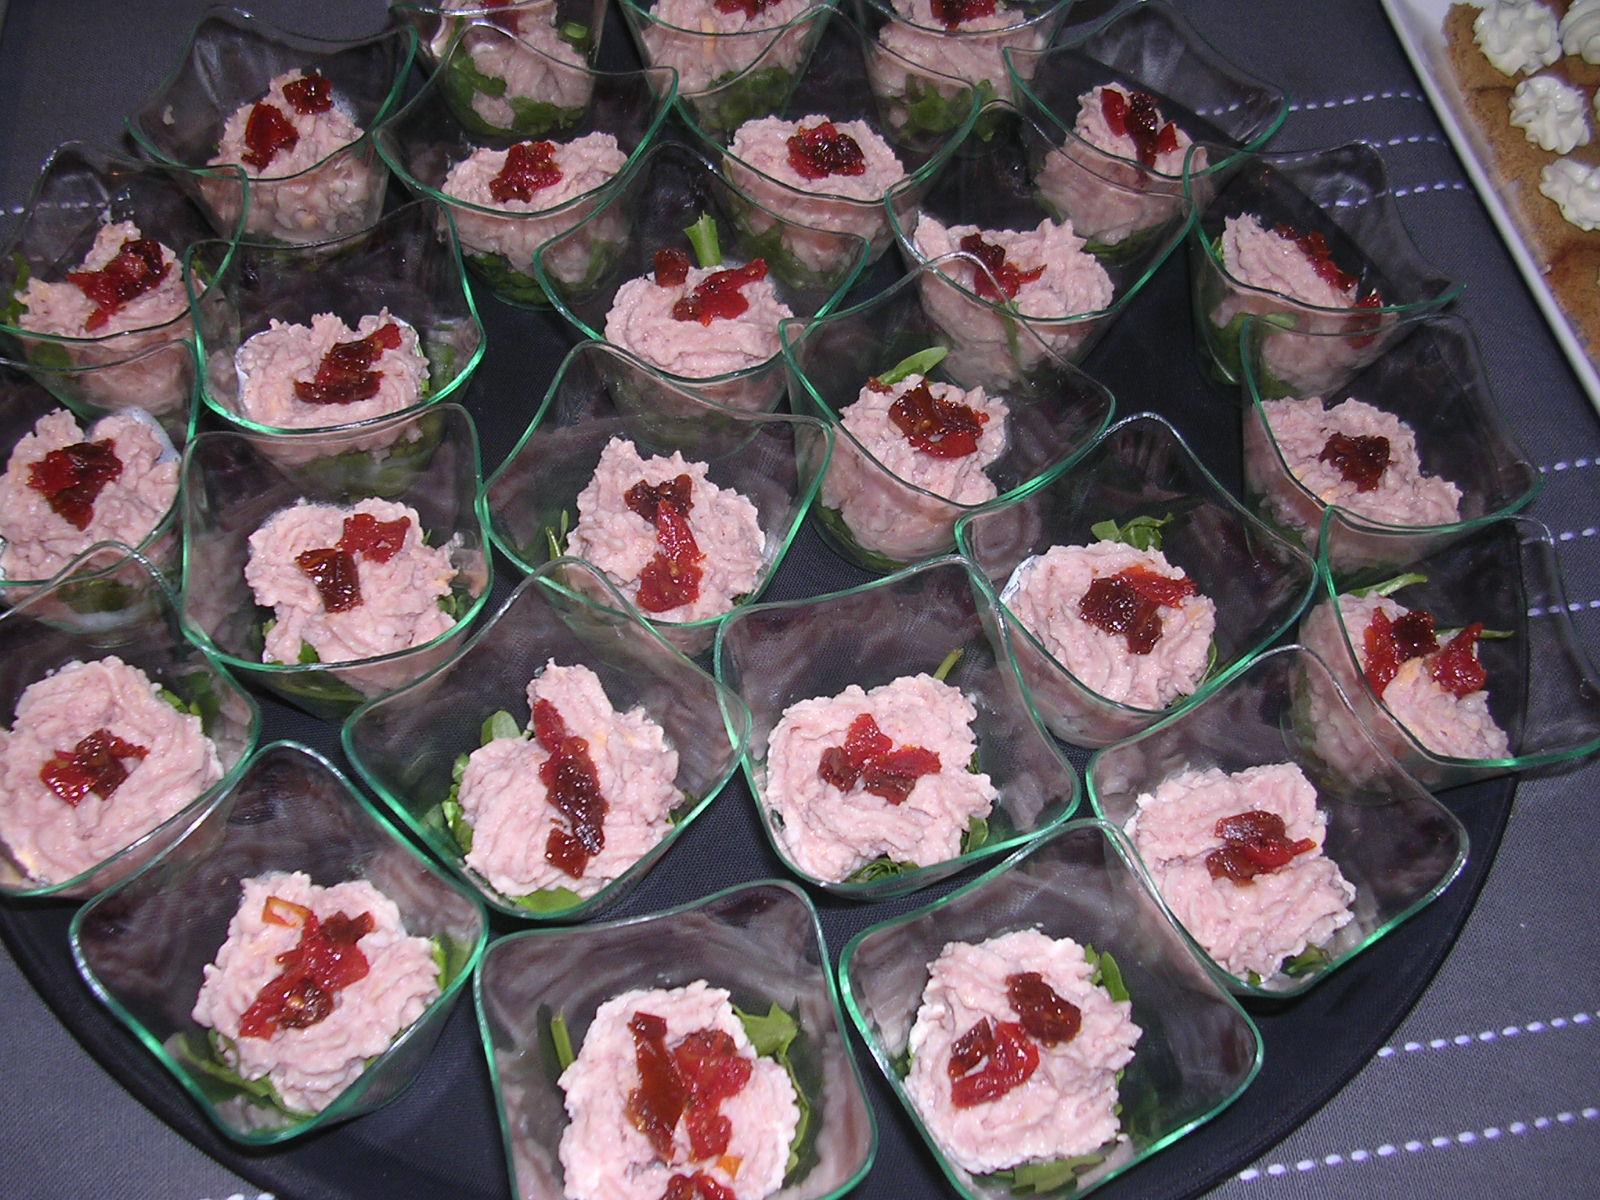 Recette verrine jambon boursin